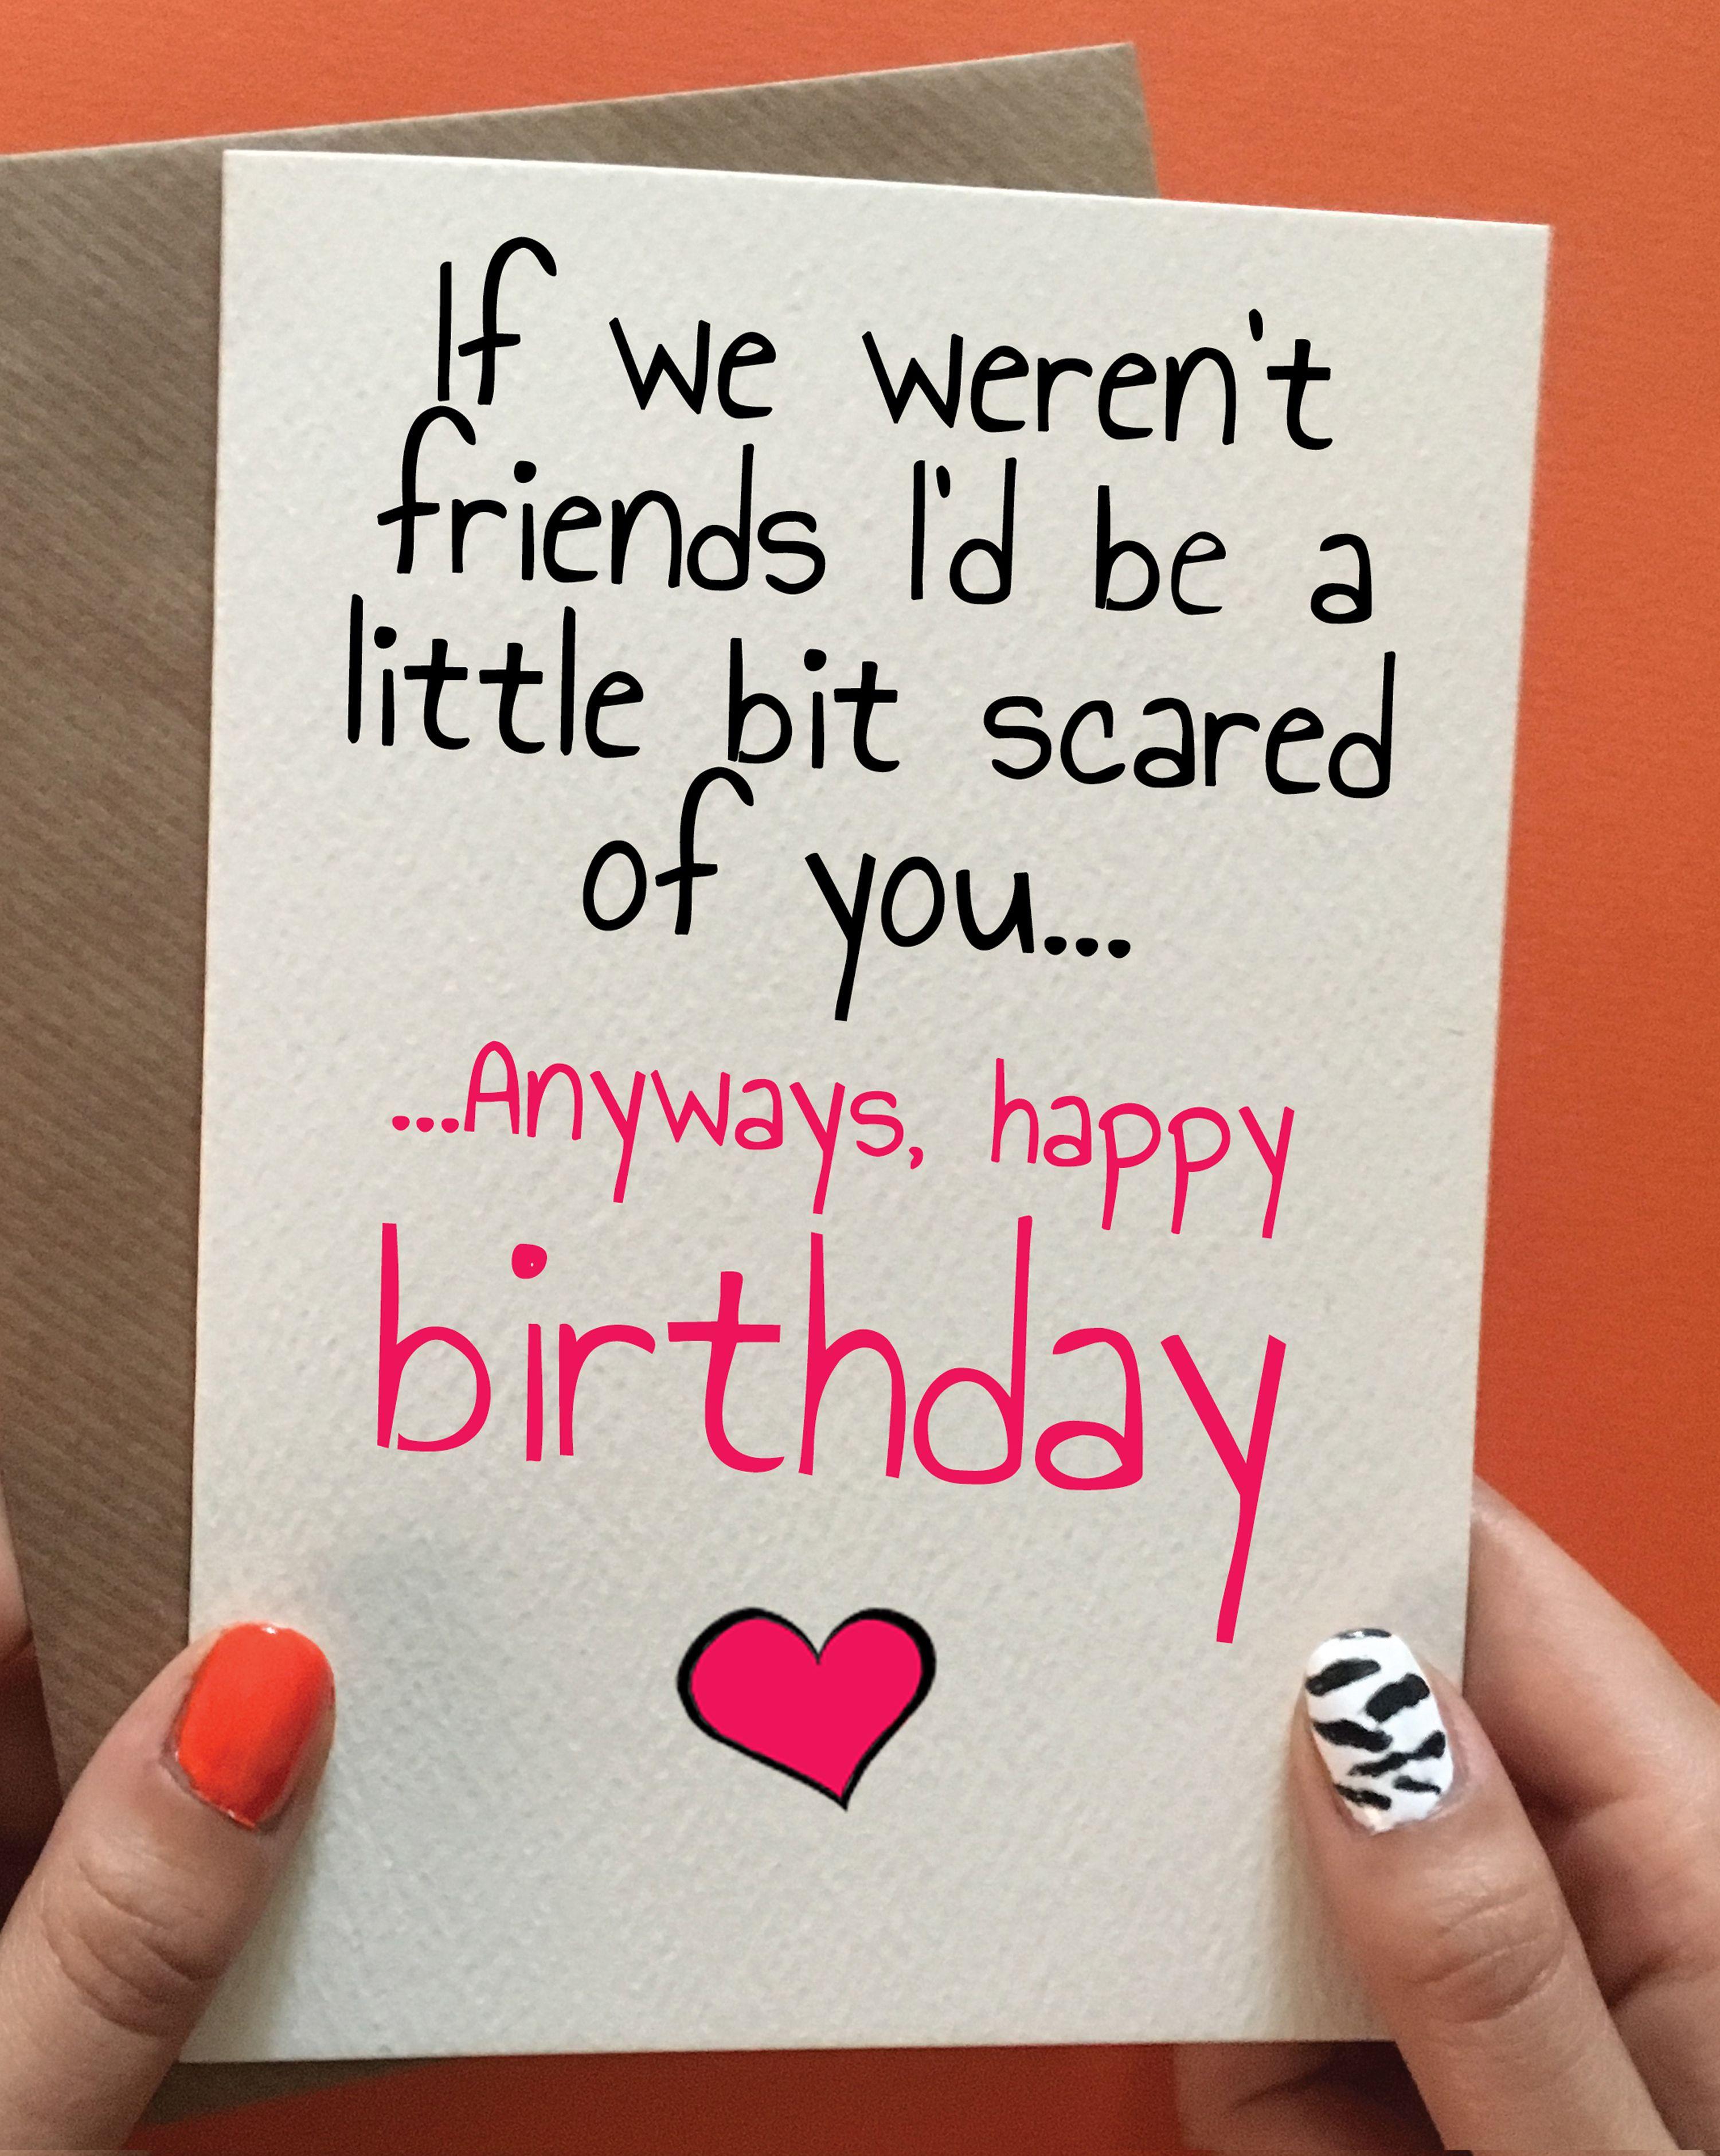 Little bit scared friend birthday card friend birthday and birthdays funny best friend birthday card best friend gift idea bookmarktalkfo Gallery